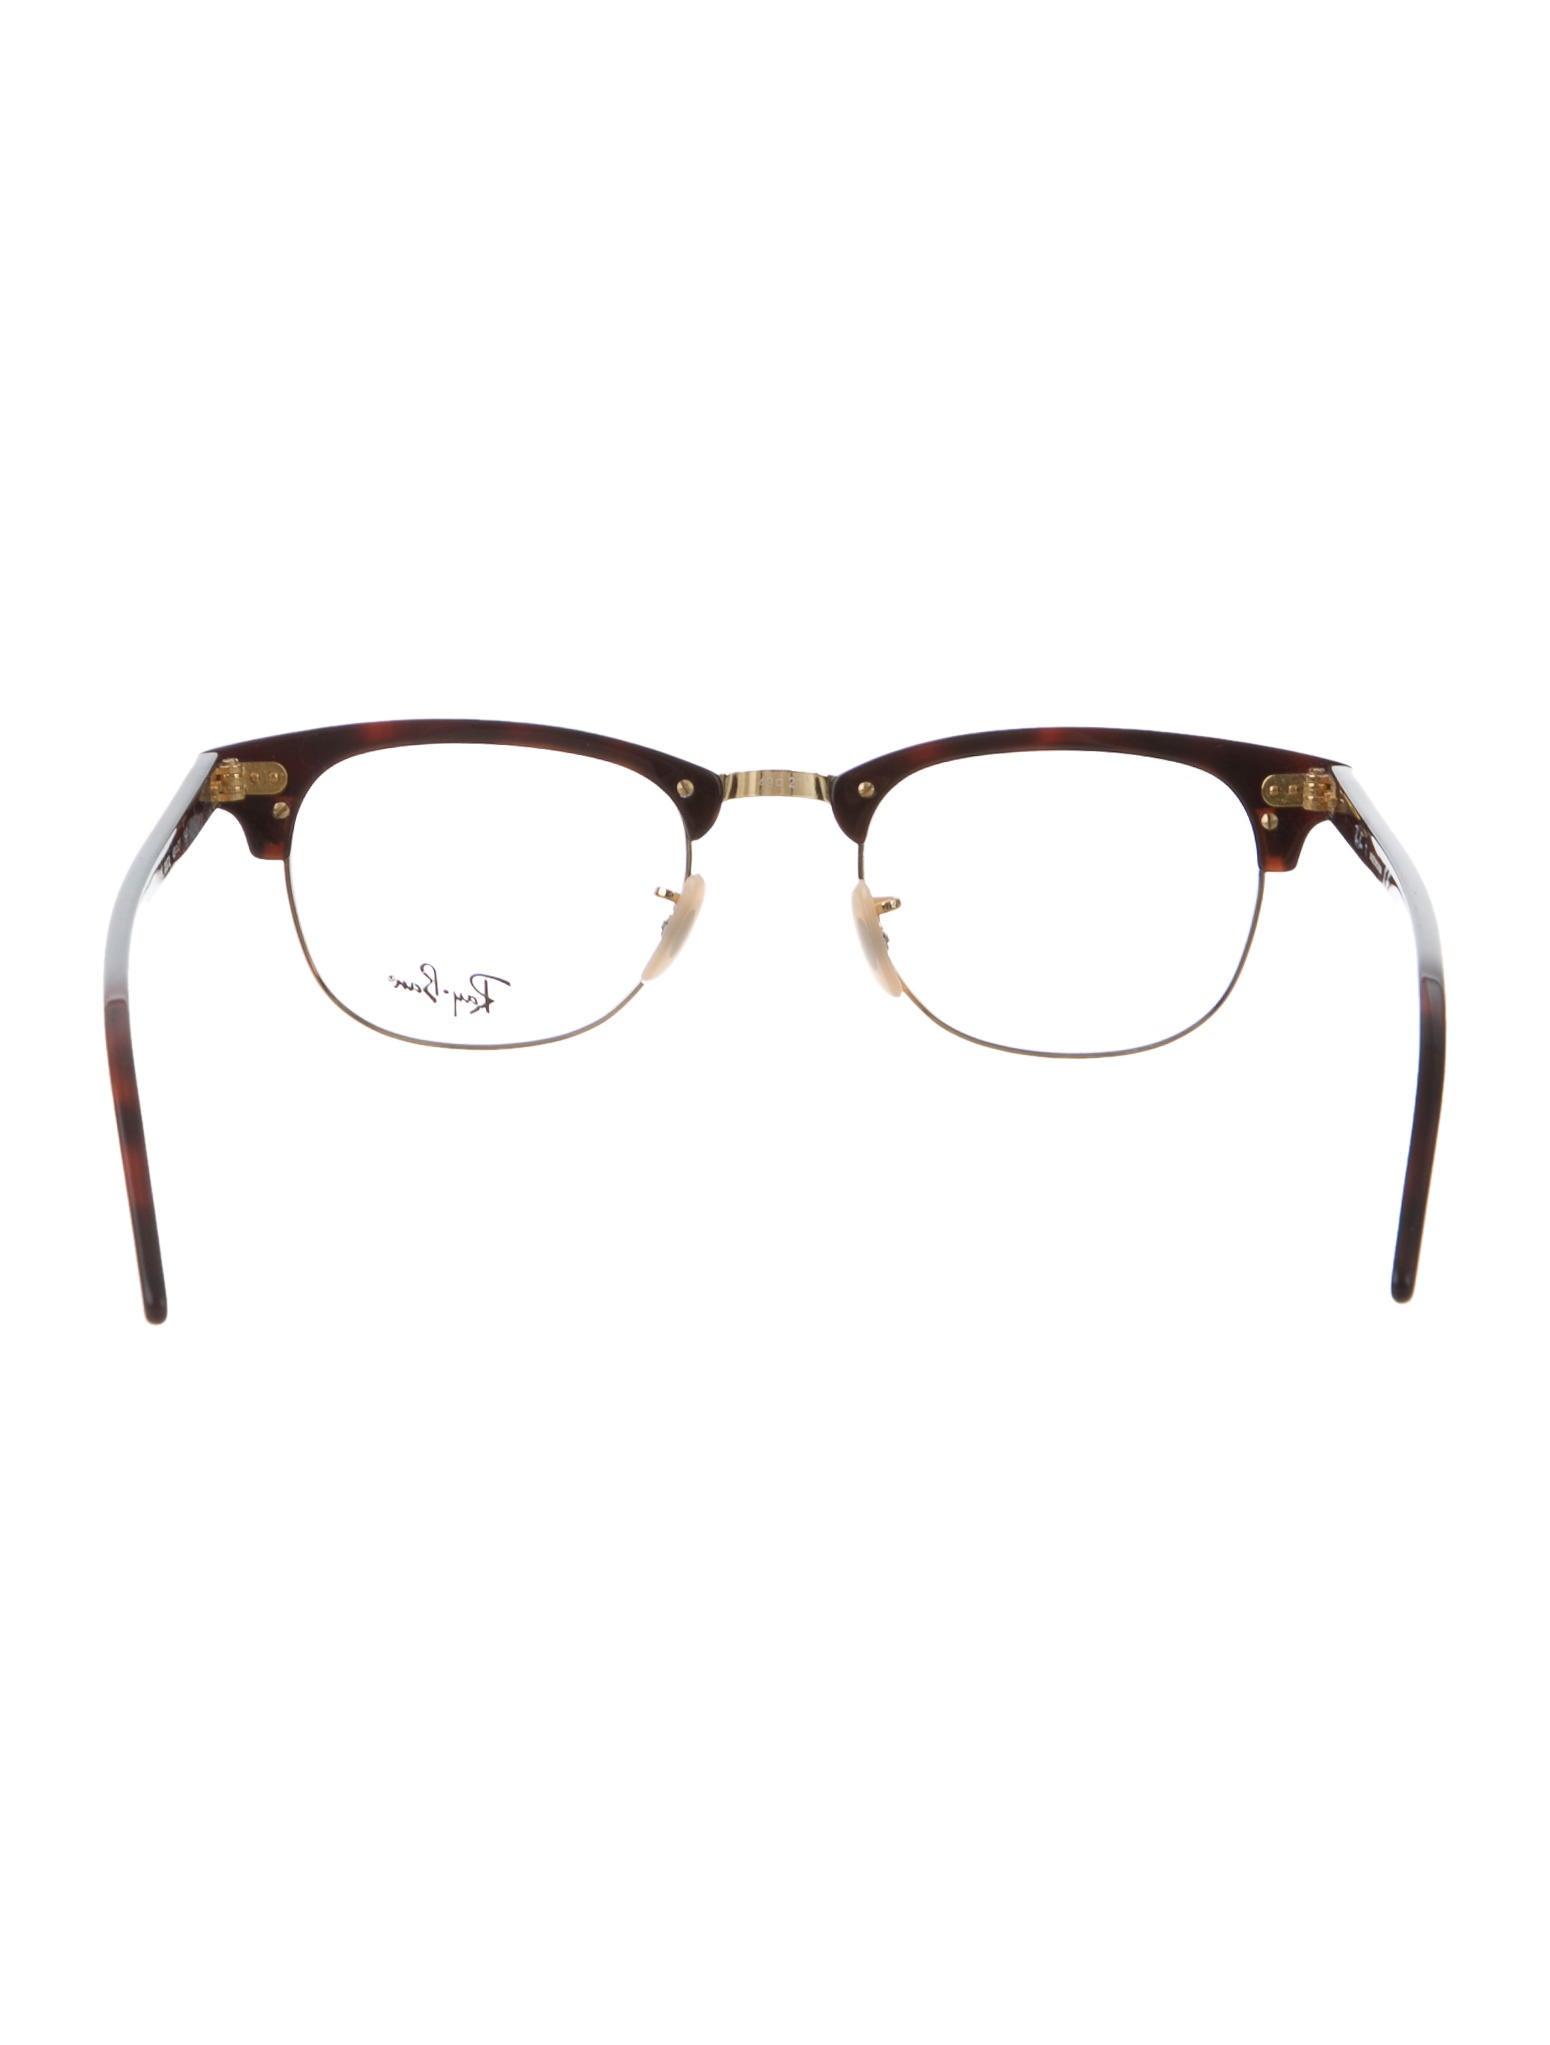 Gold Eyeglass Frames Ray Ban : Ray-Ban Tortoiseshell Gold-Tone Eyeglasses - Accessories ...